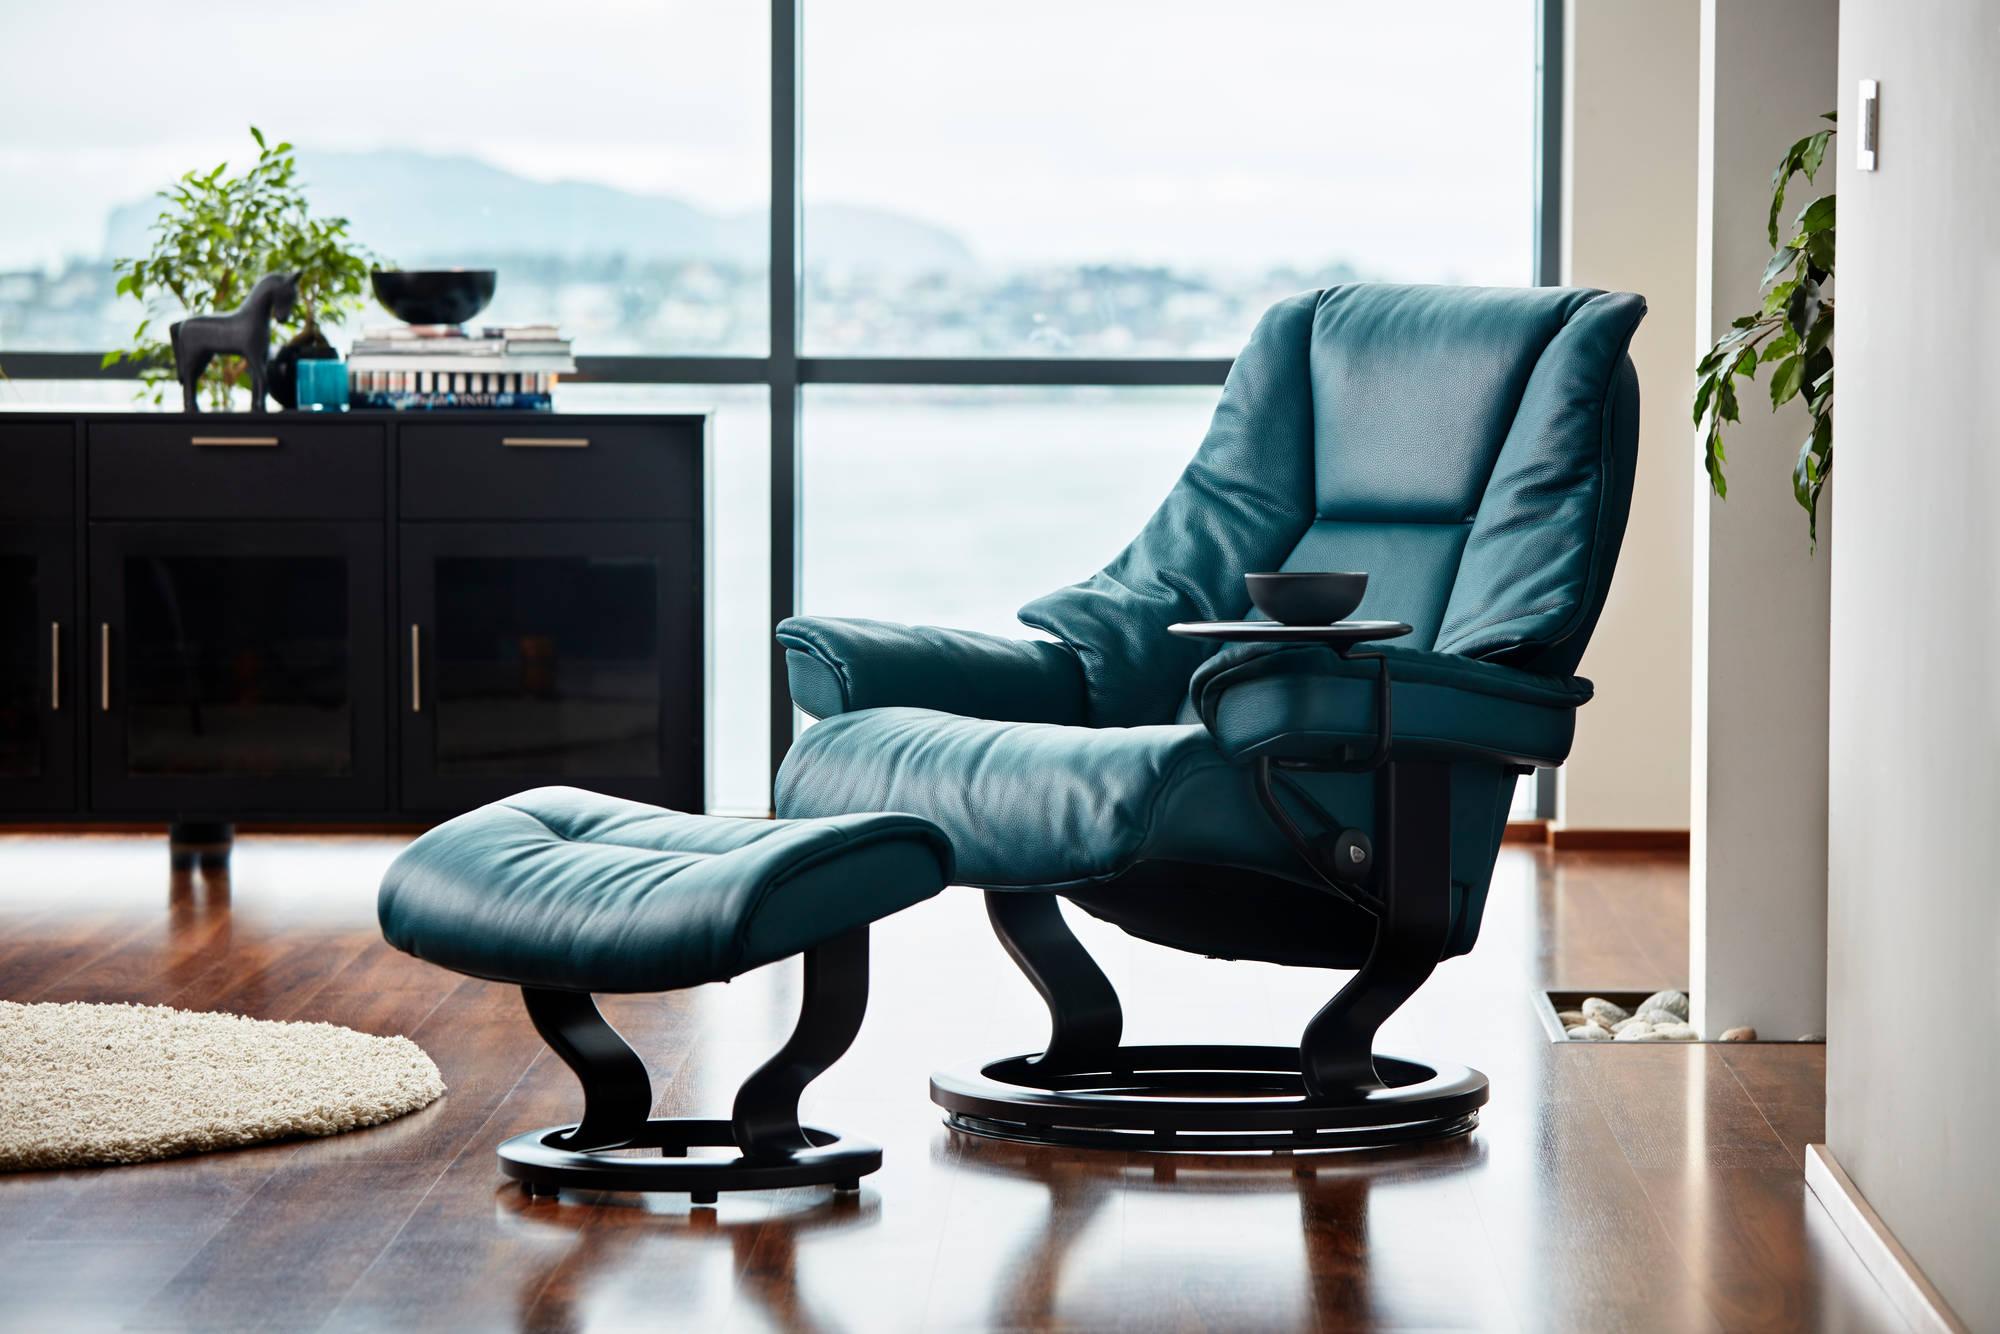 Stressless Live - Stressless Chair